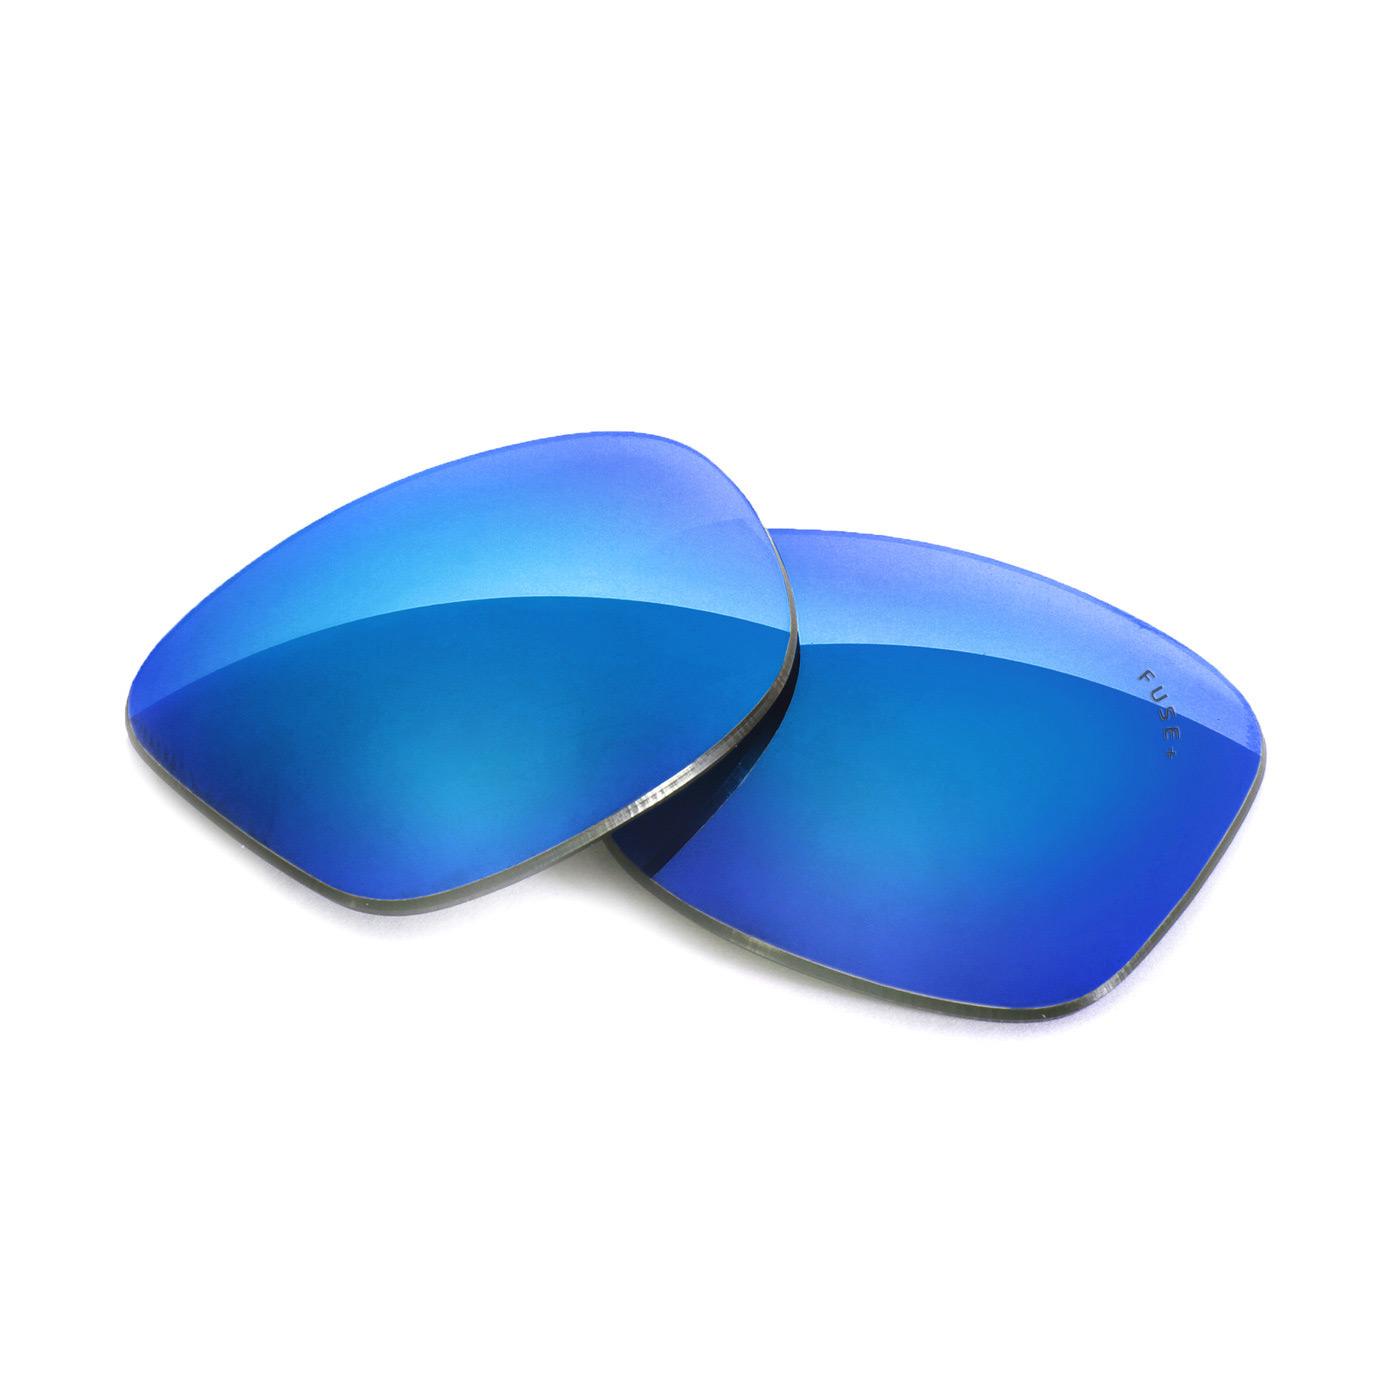 Plus Replacement Lenses for Persol Ratti 009 Fuse Lenses Fuse